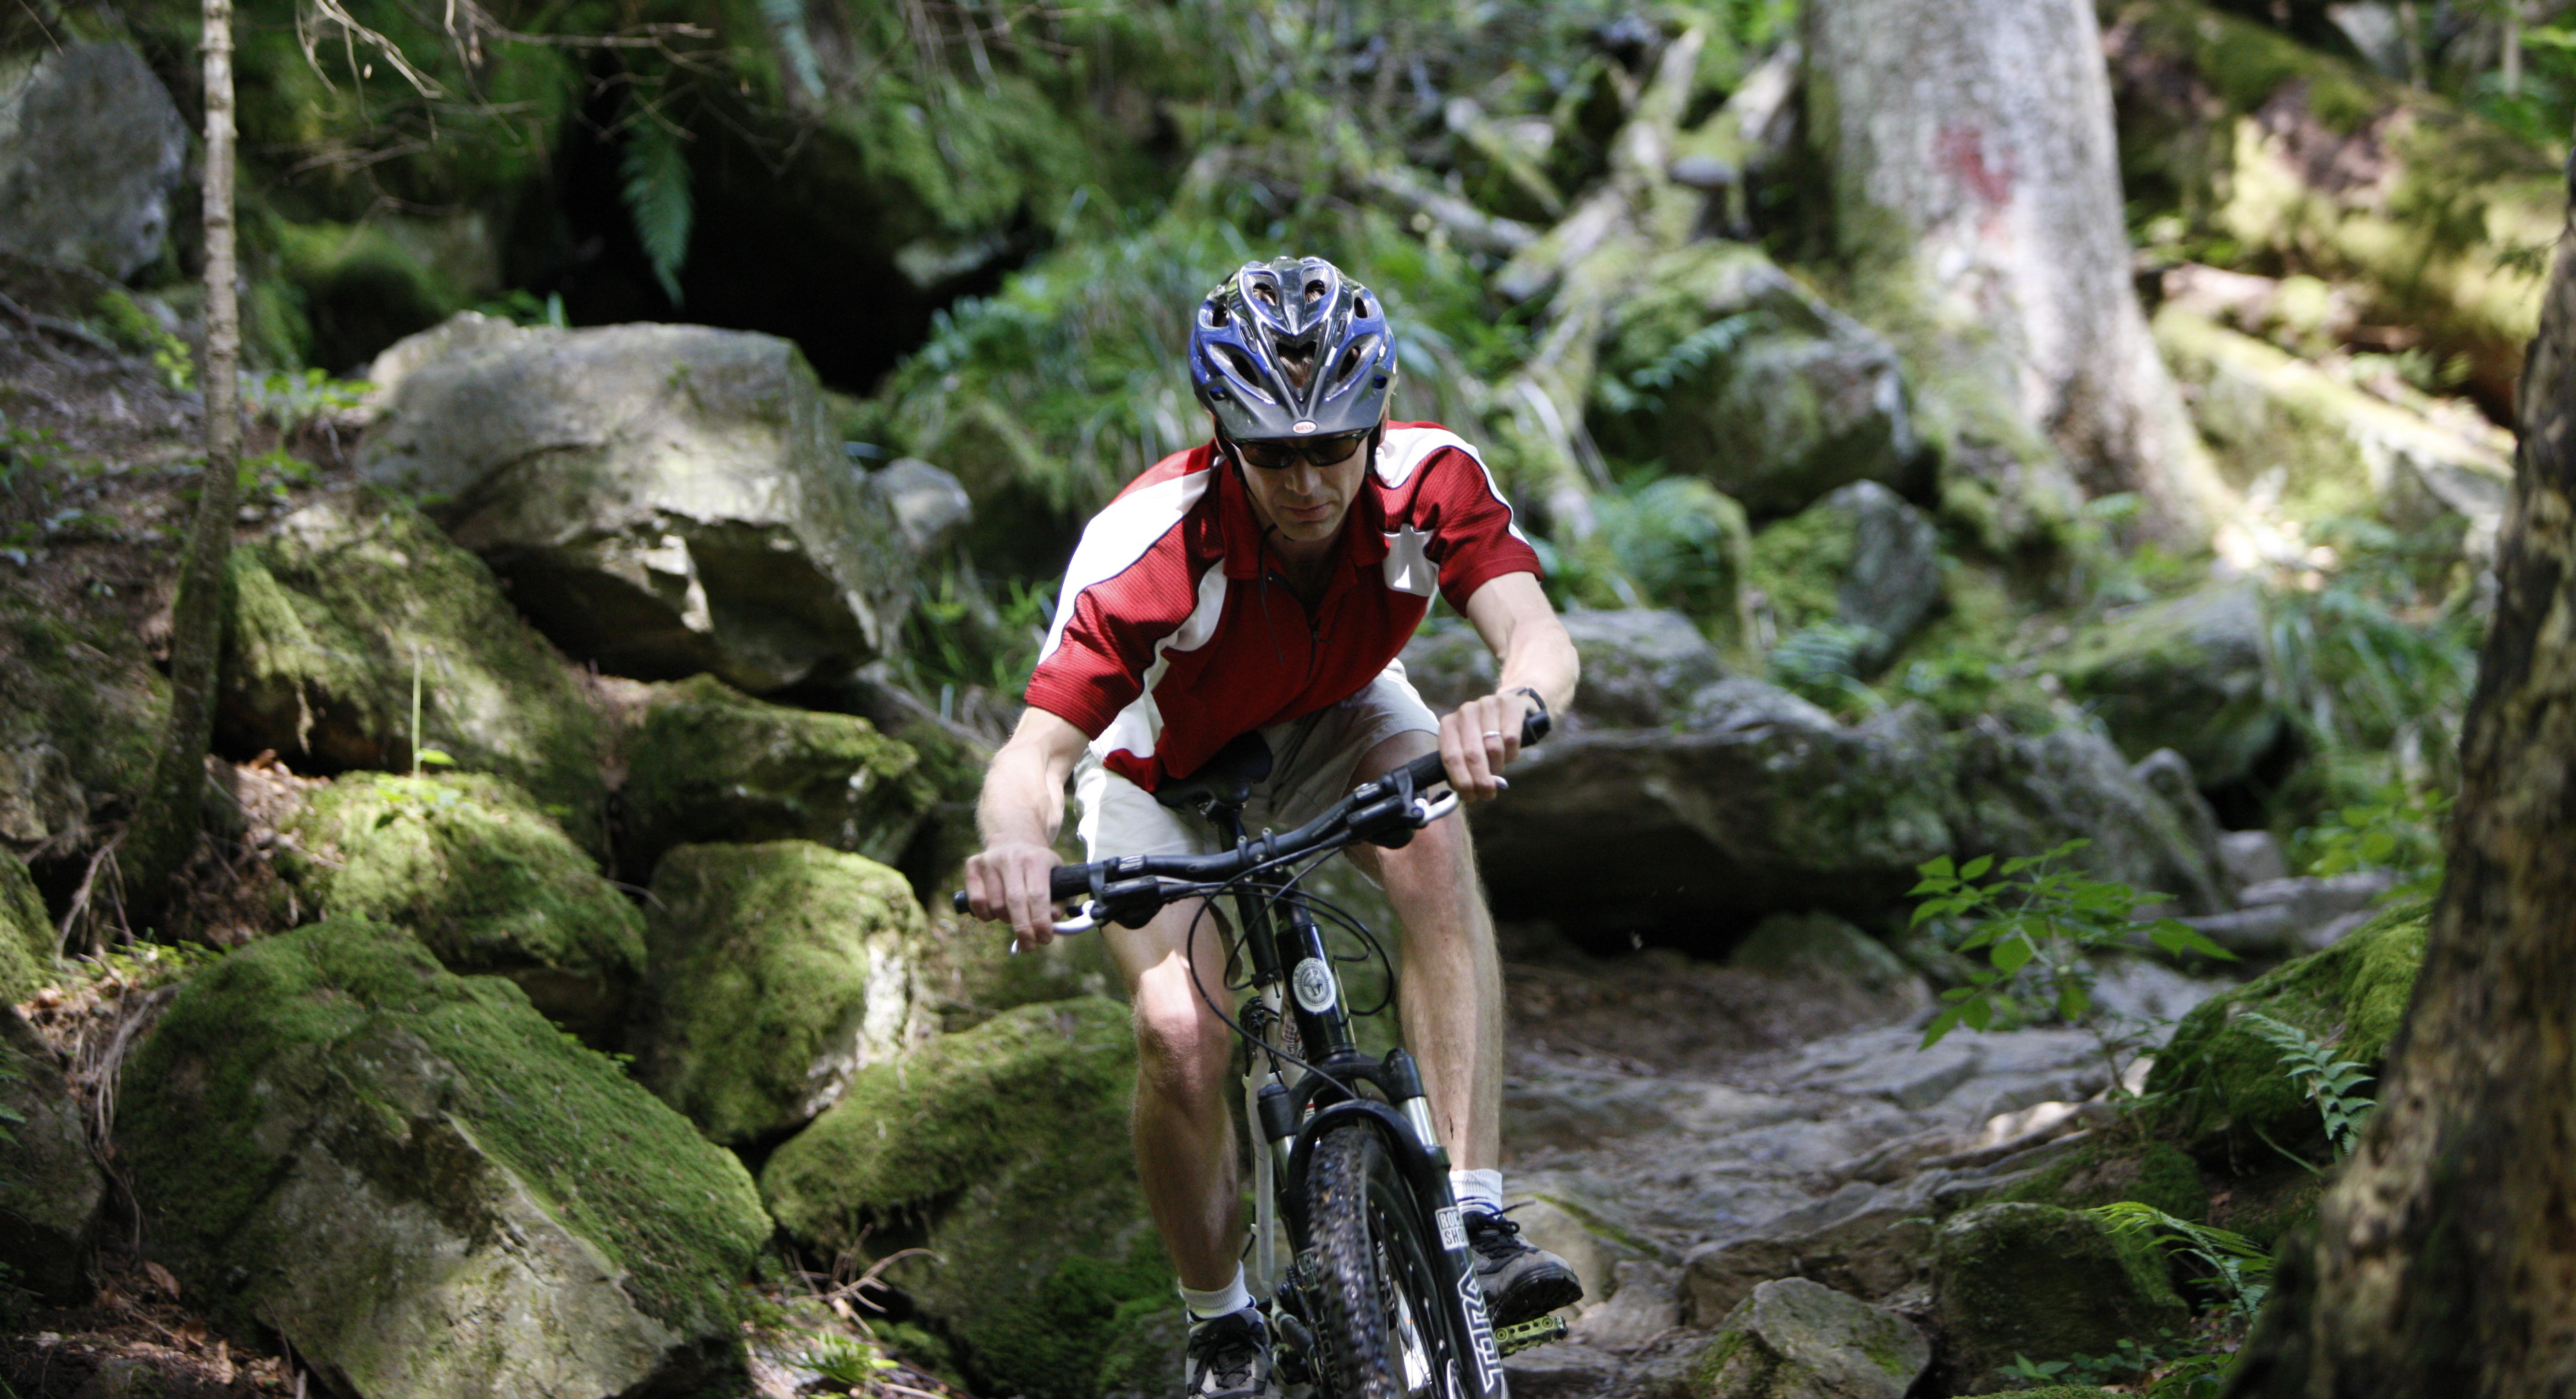 Mountain Bike Fahrer Wald © Christoph Eberle/STG